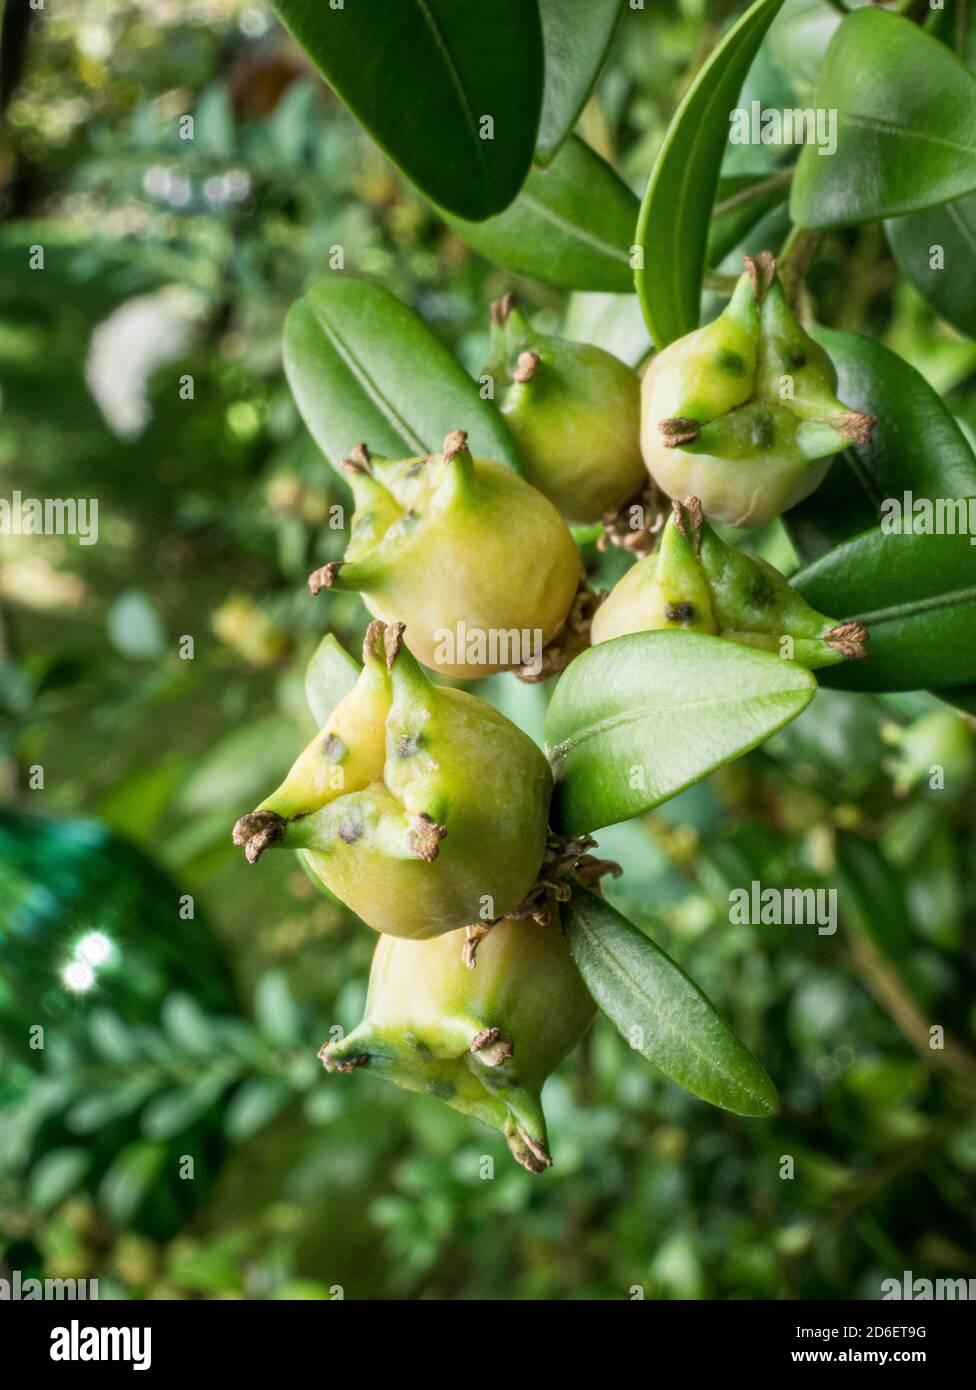 Common boxwood (Buxus sempervirens), fruits, close-up, Bavaria Germany, Europe Stock Photo